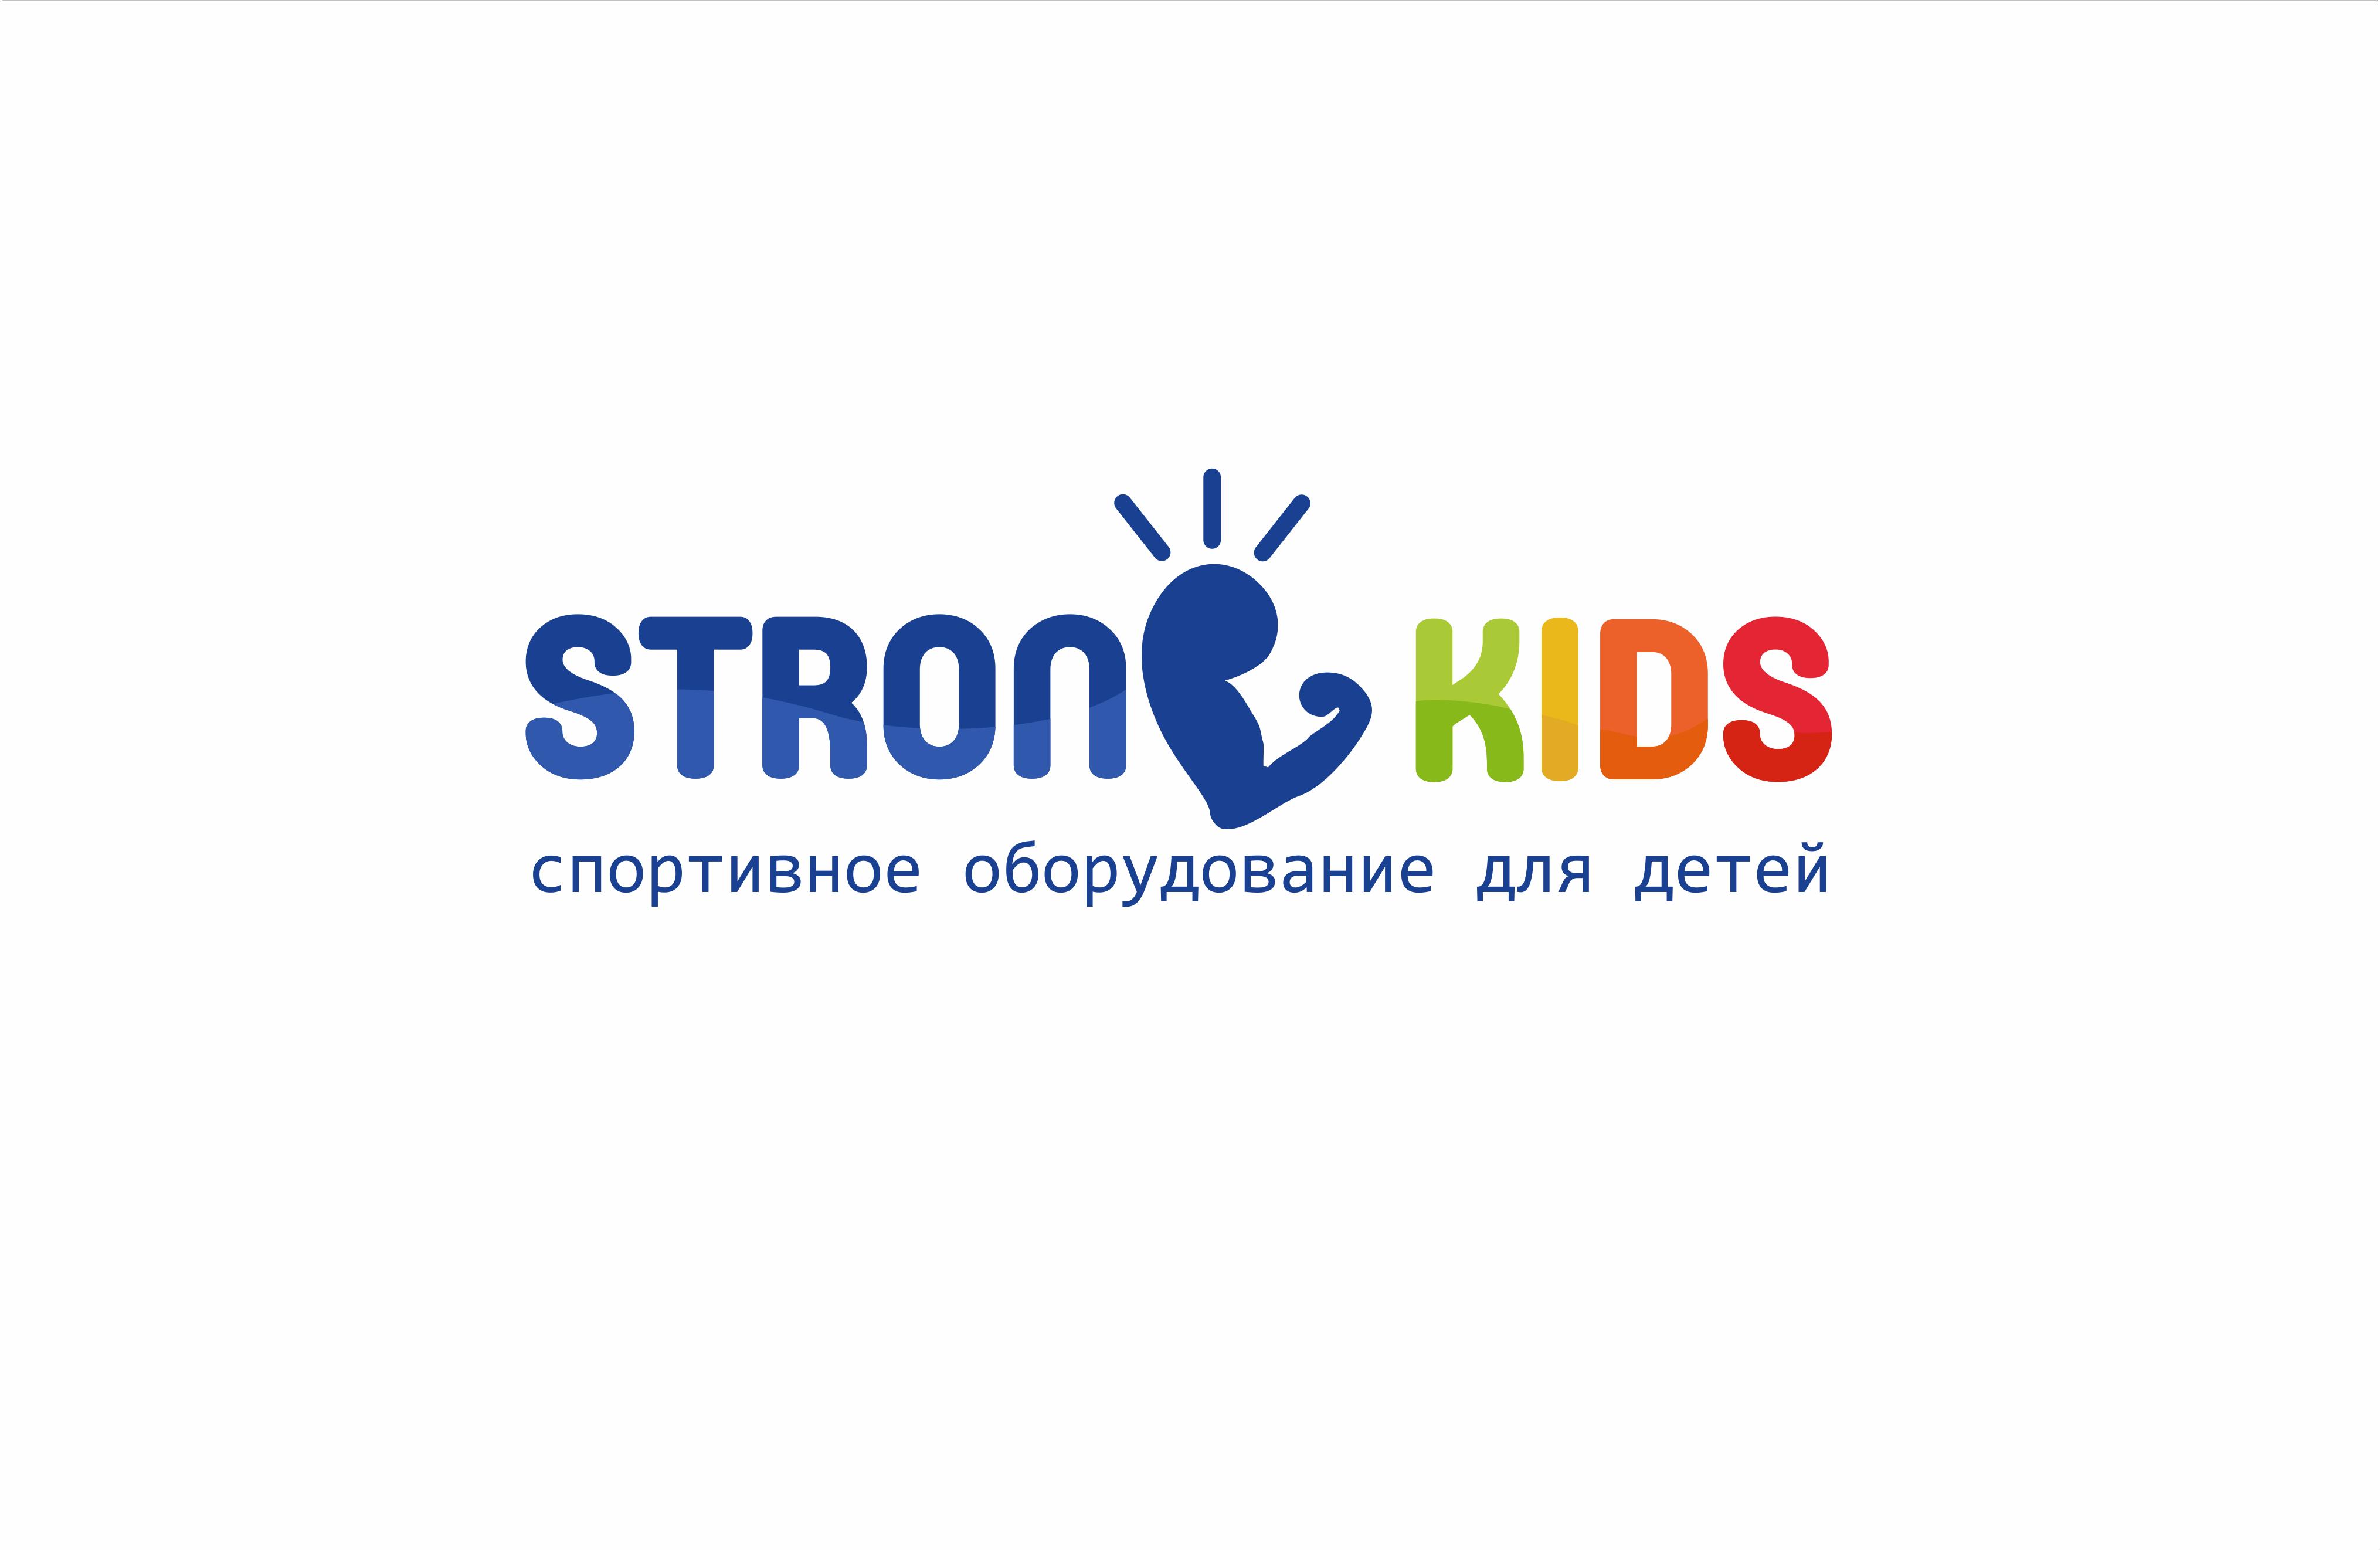 Логотип для Детского Интернет Магазина StrongKids фото f_1835c6e51960d6d6.png